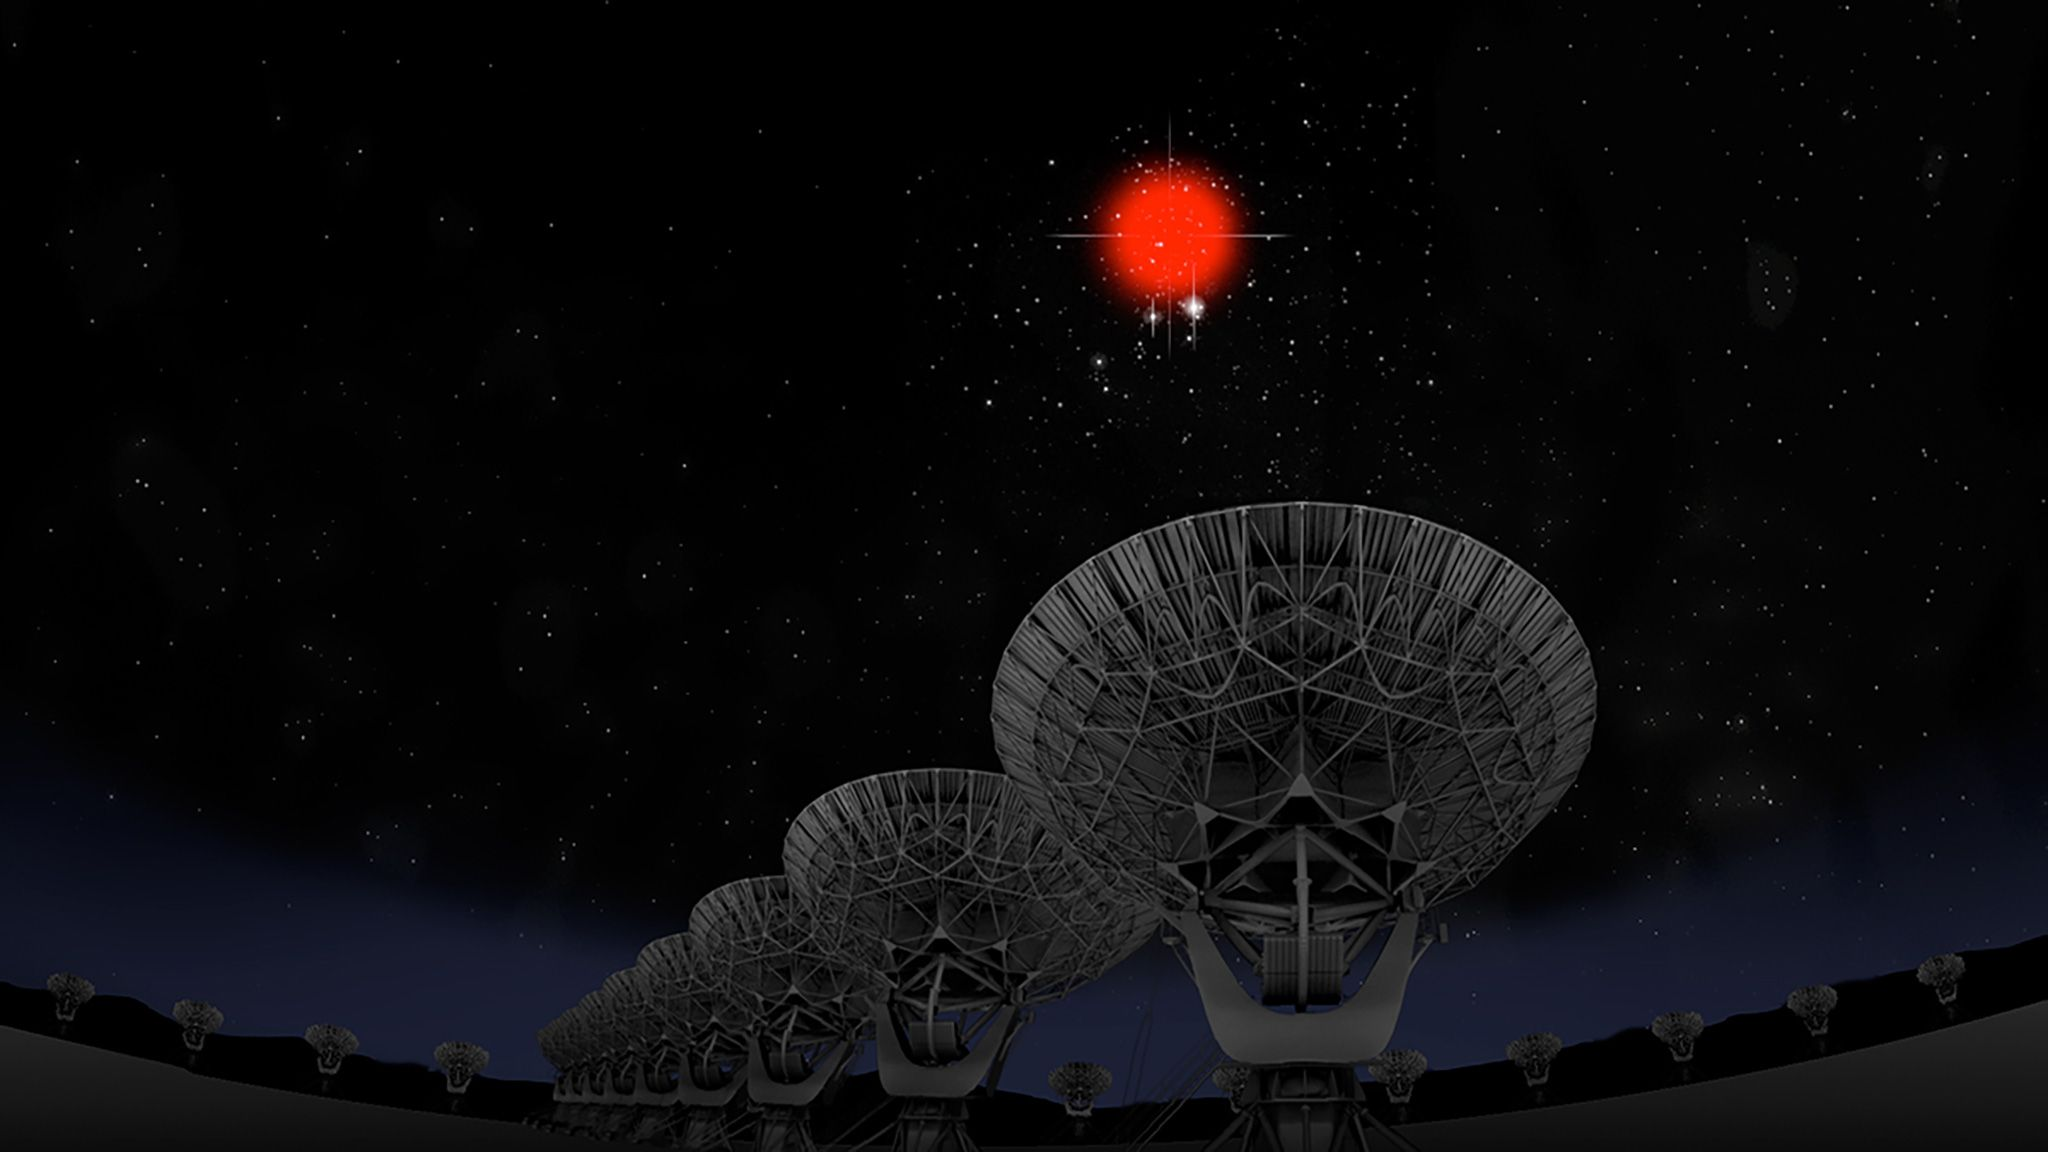 Strange Radio Bursts Seen ing From a Galaxy Far Far Away